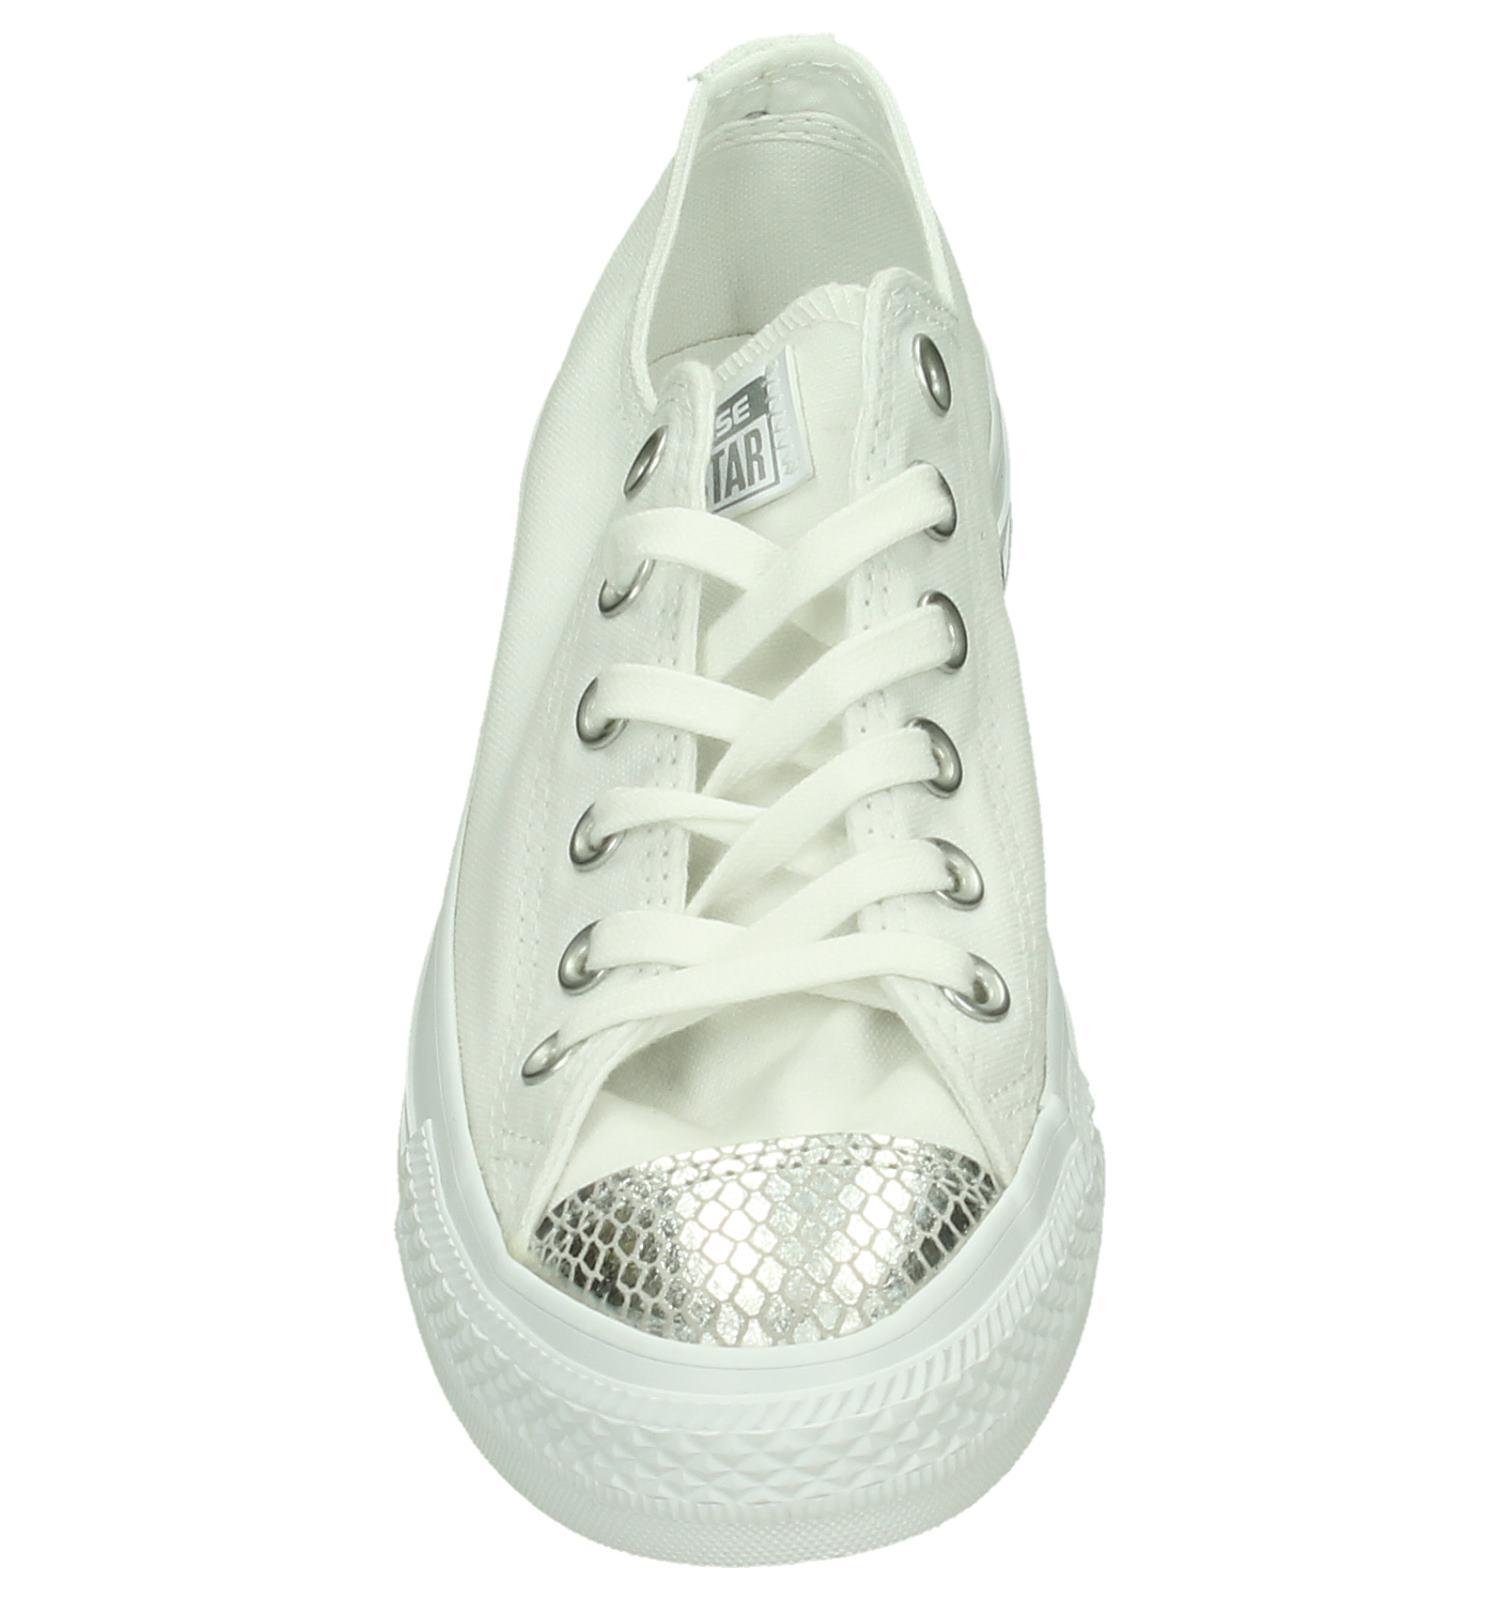 c9fc5774cea Witte Sneakers Converse Chuck Taylor All Star Ox | TORFS.BE | Gratis  verzend en retour